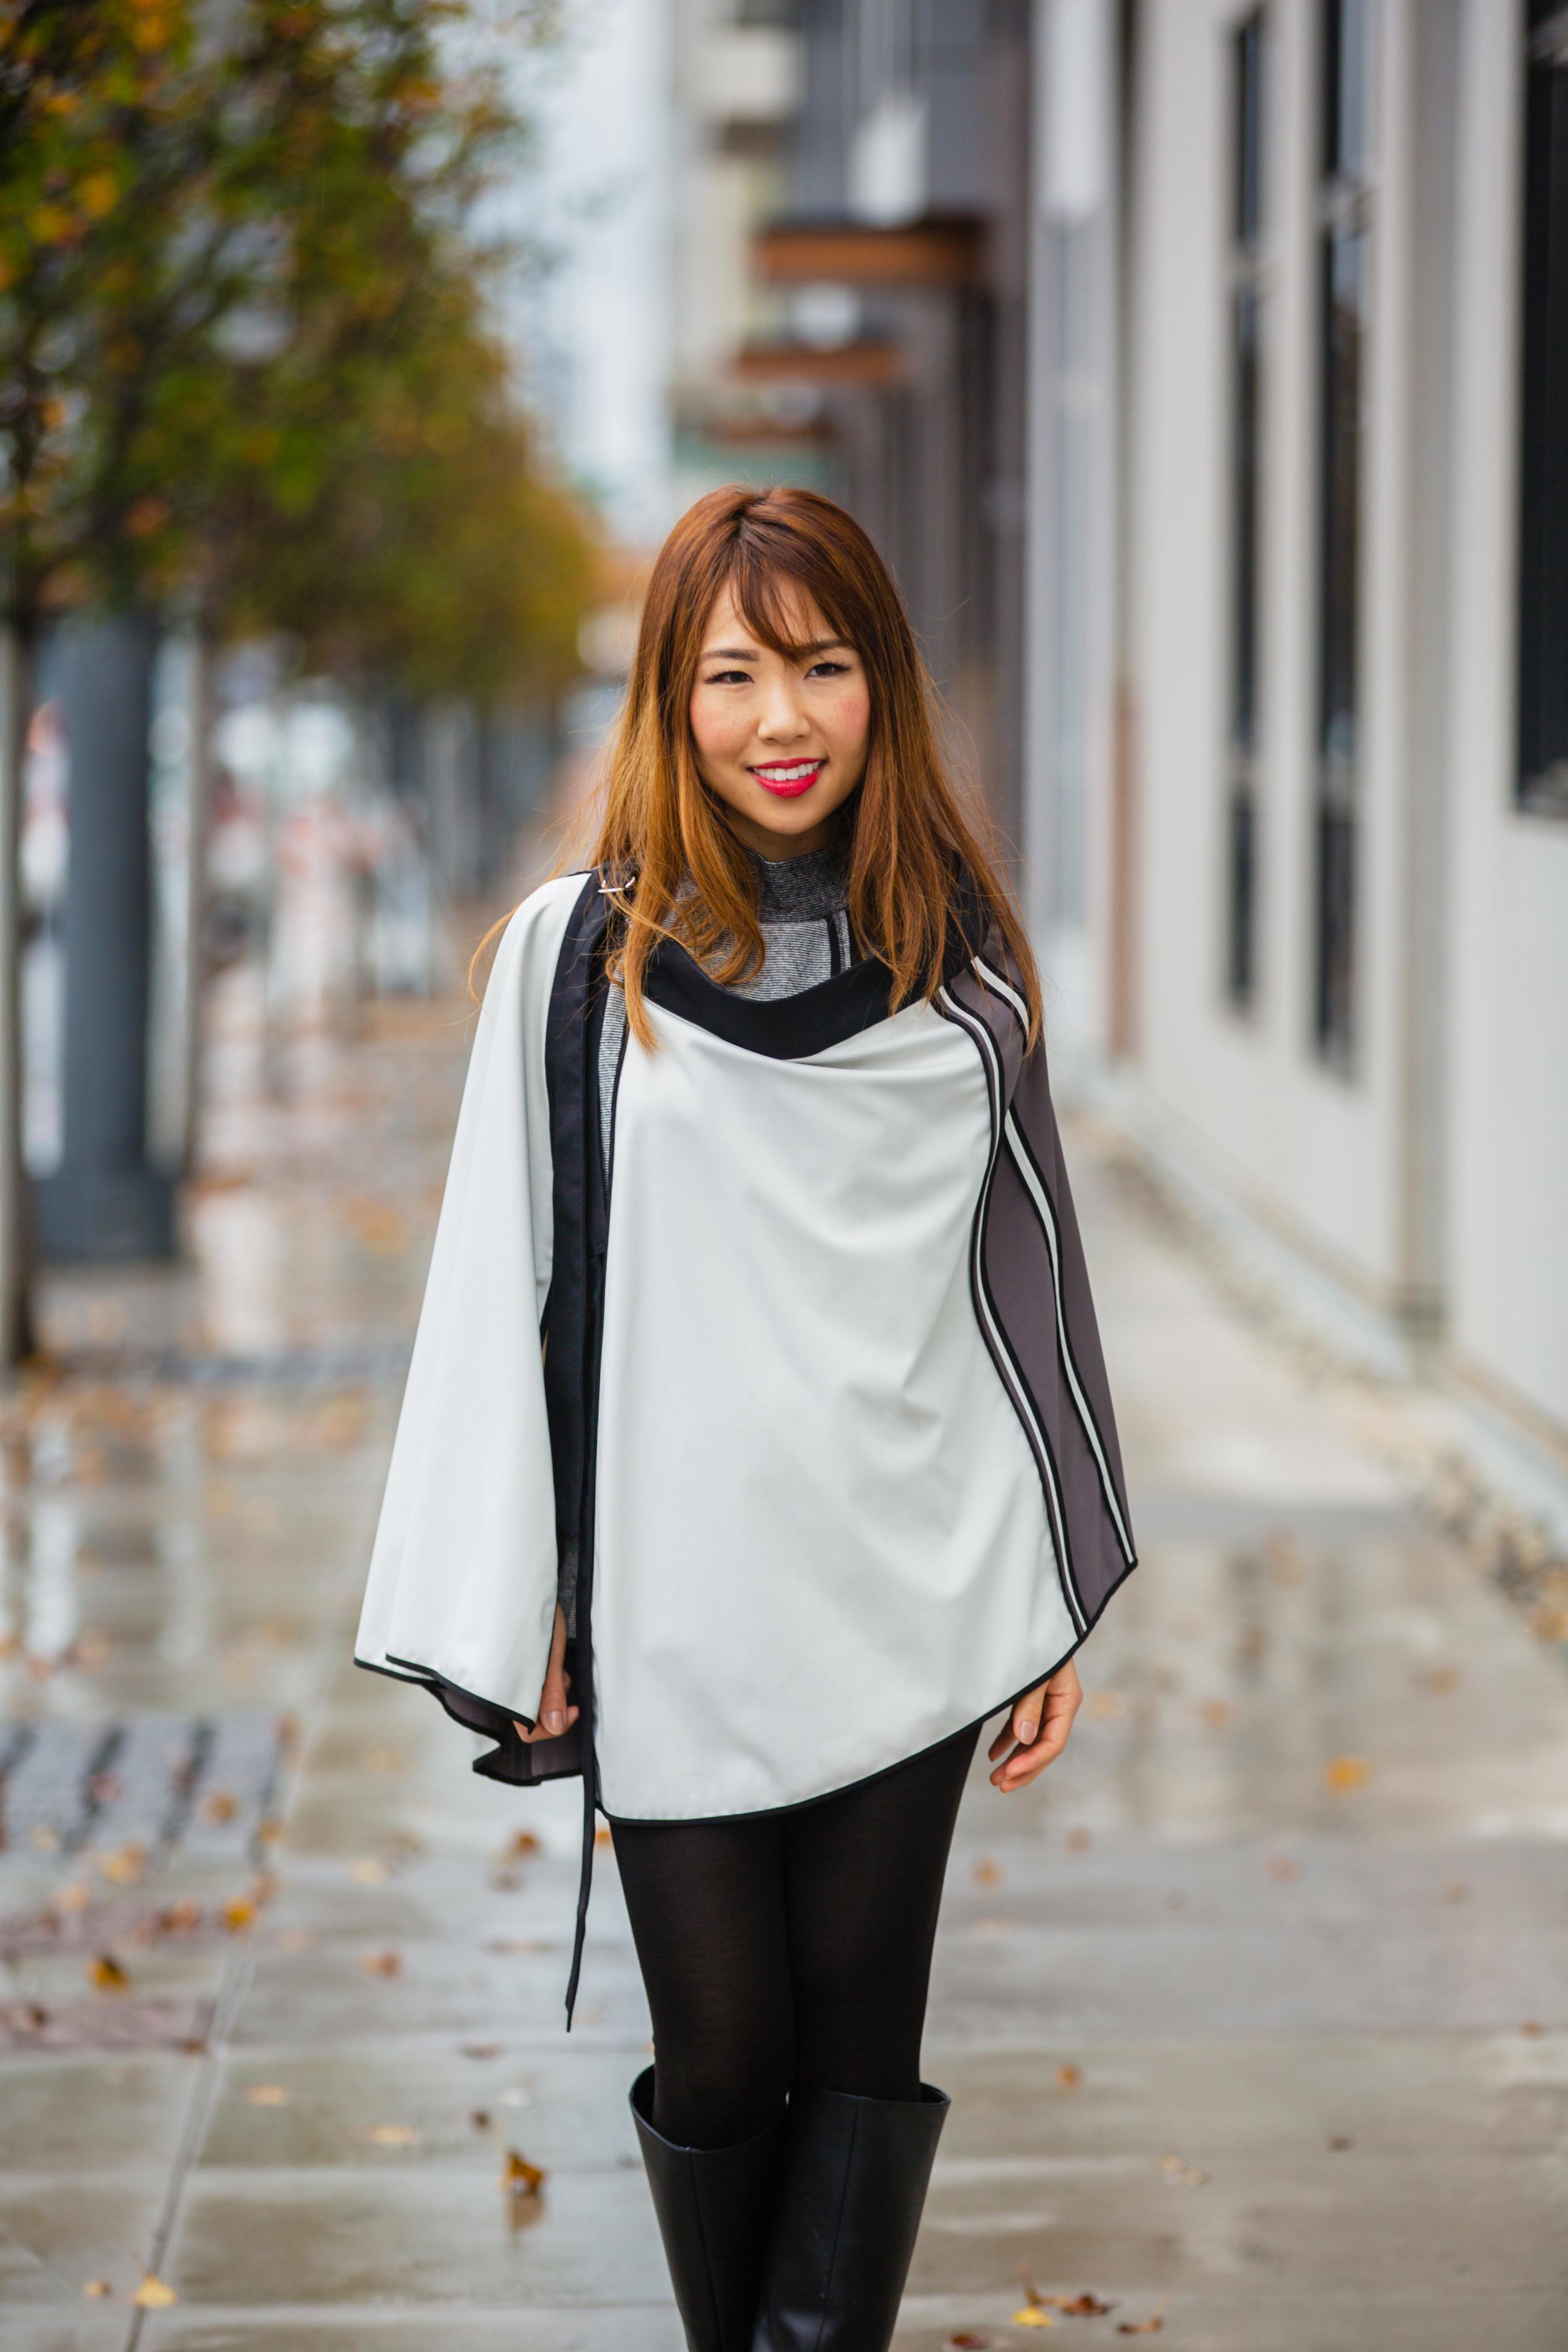 Convertible Skirt Cape (Reversible/Water Resistant)